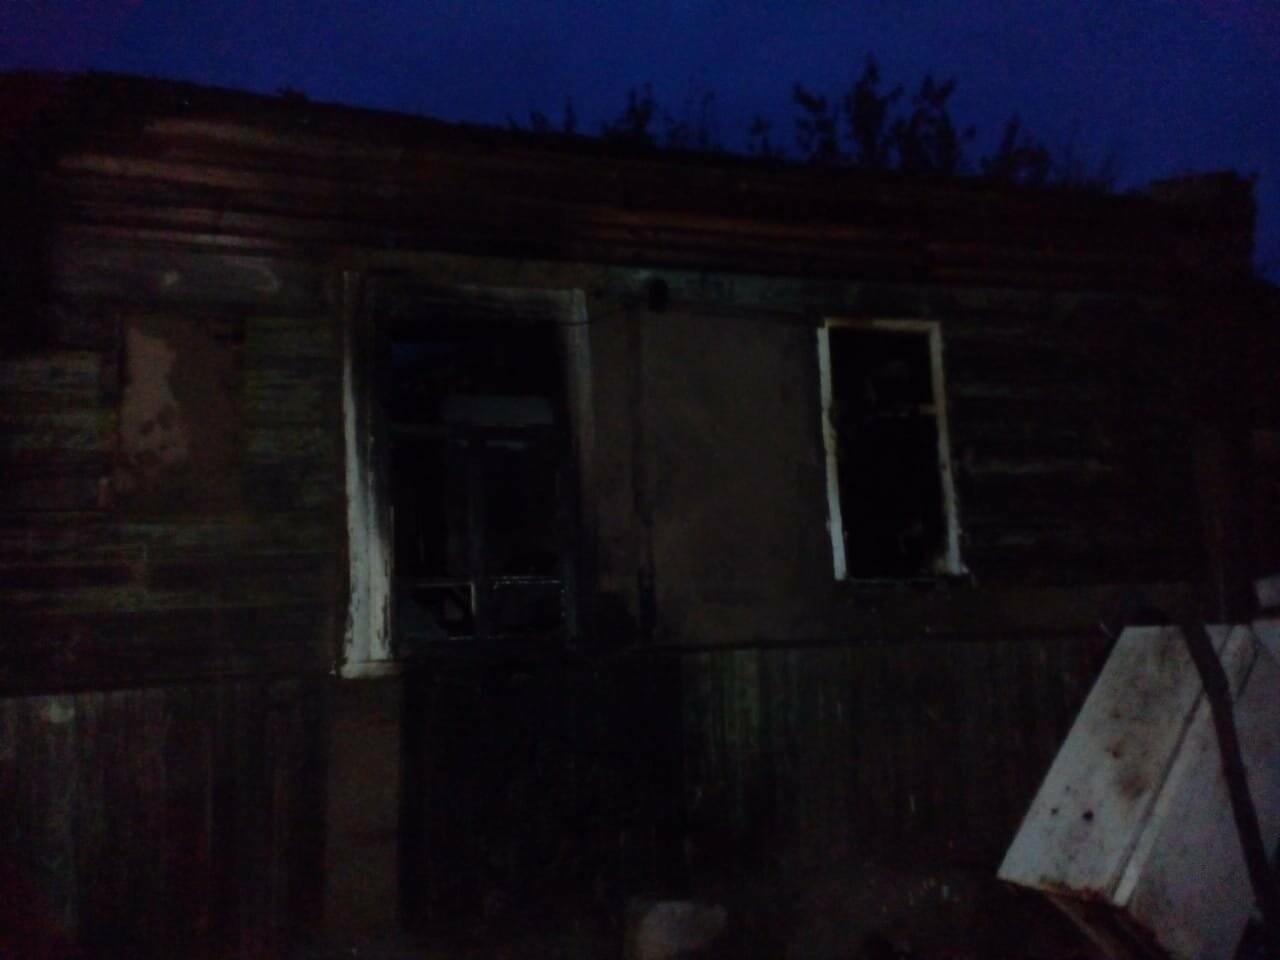 Под Тамбовом при пожаре погибли 4 человека: среди них 4-летний ребенок. ВИДЕО, фото-6